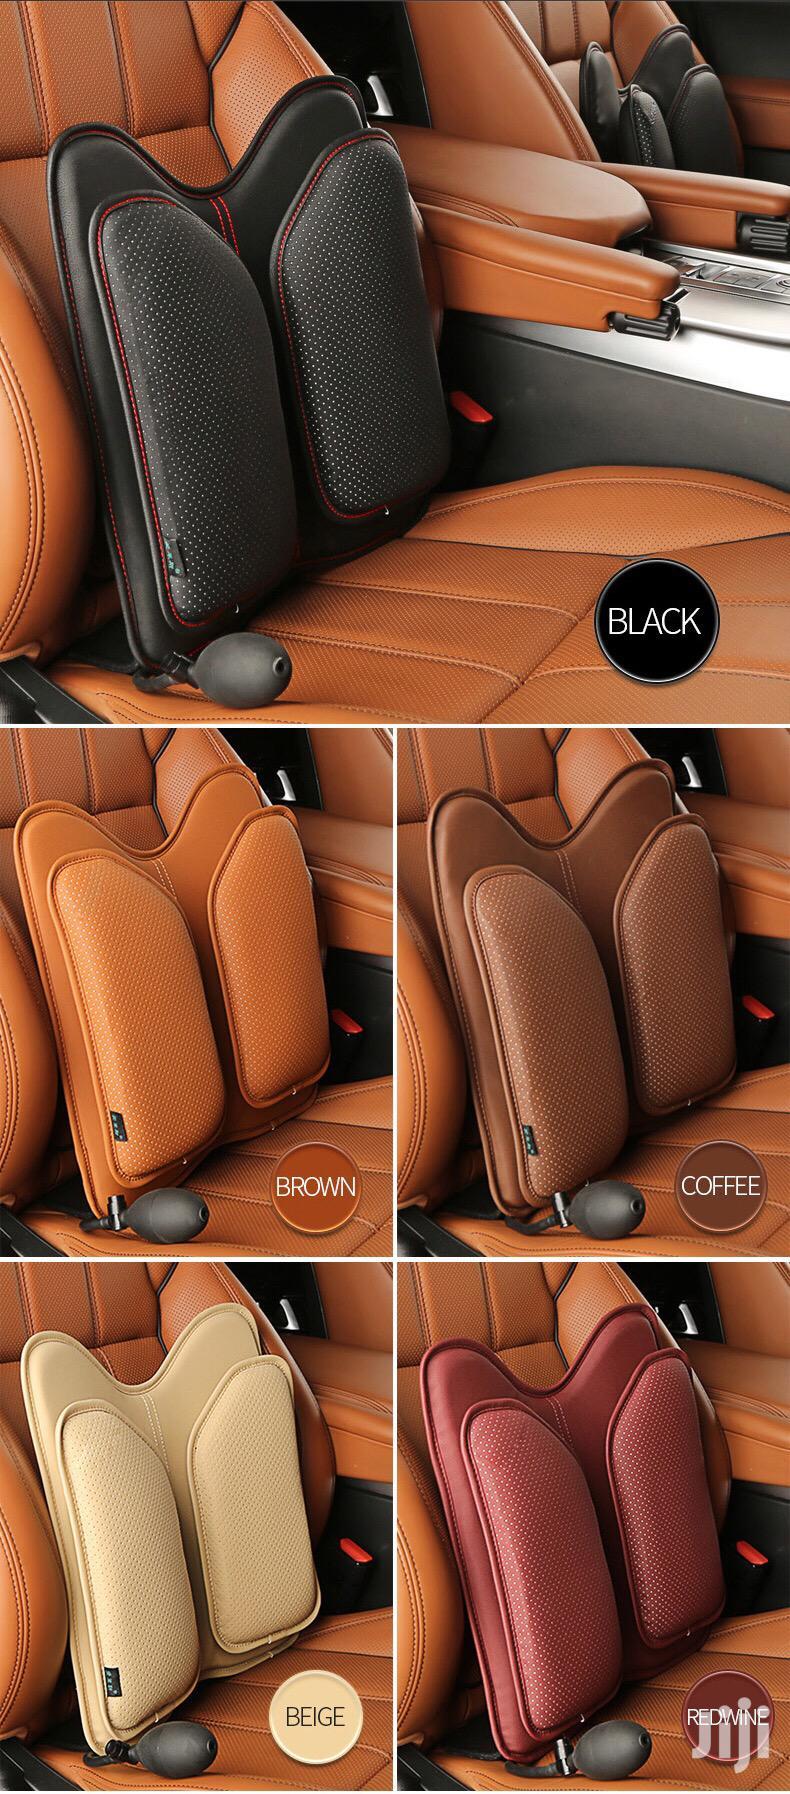 Leather Airbag Cushion